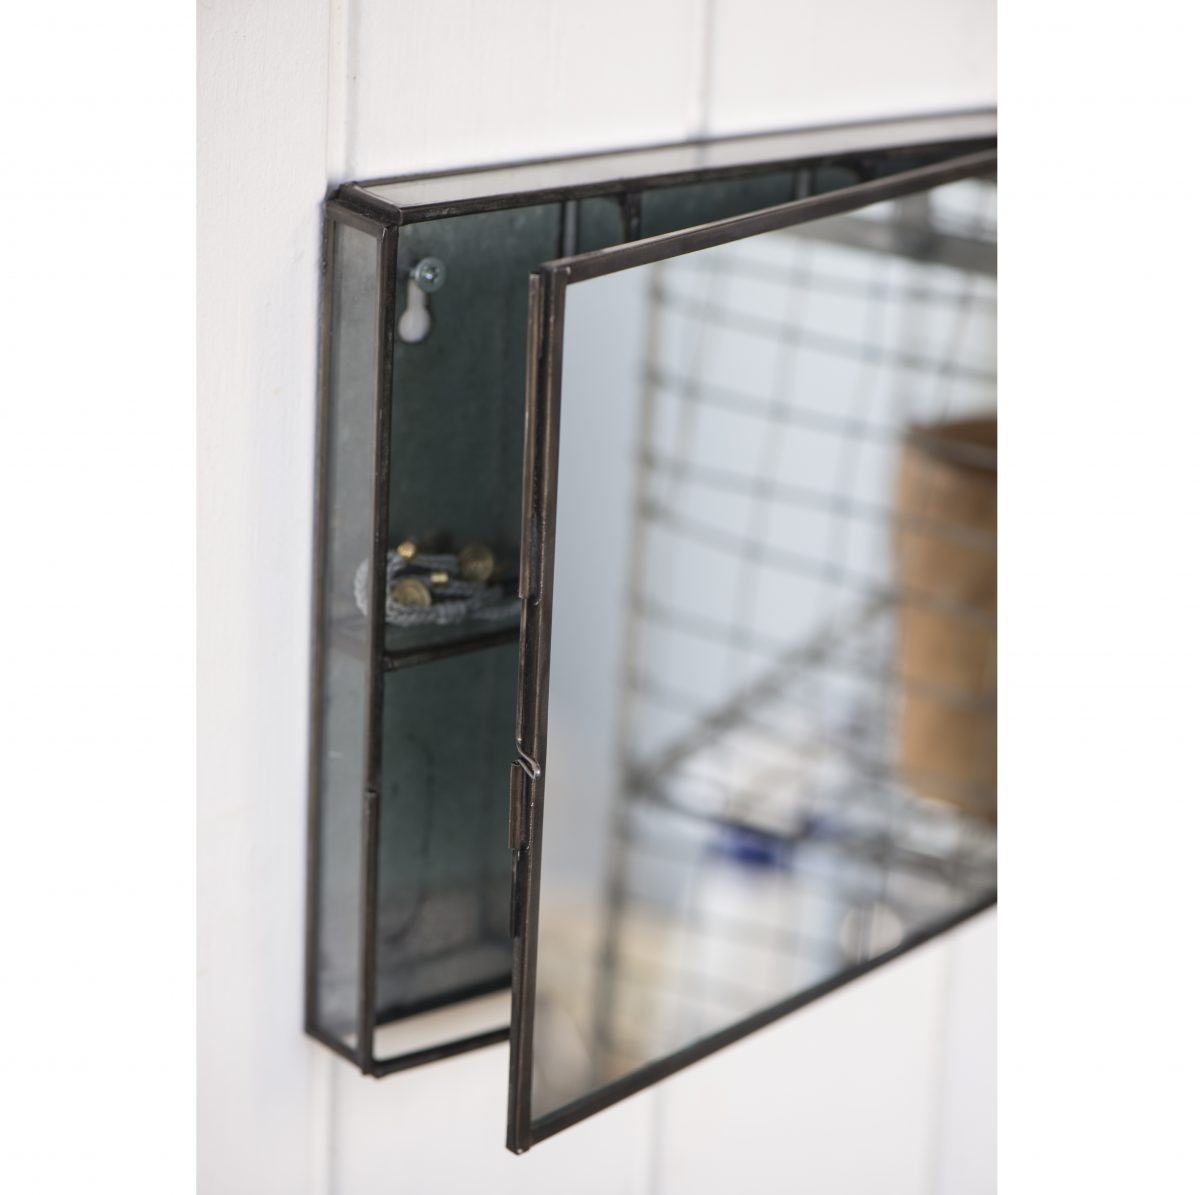 Black Metal Wall Hanging Storage Box With Mirror By Ib Laursen